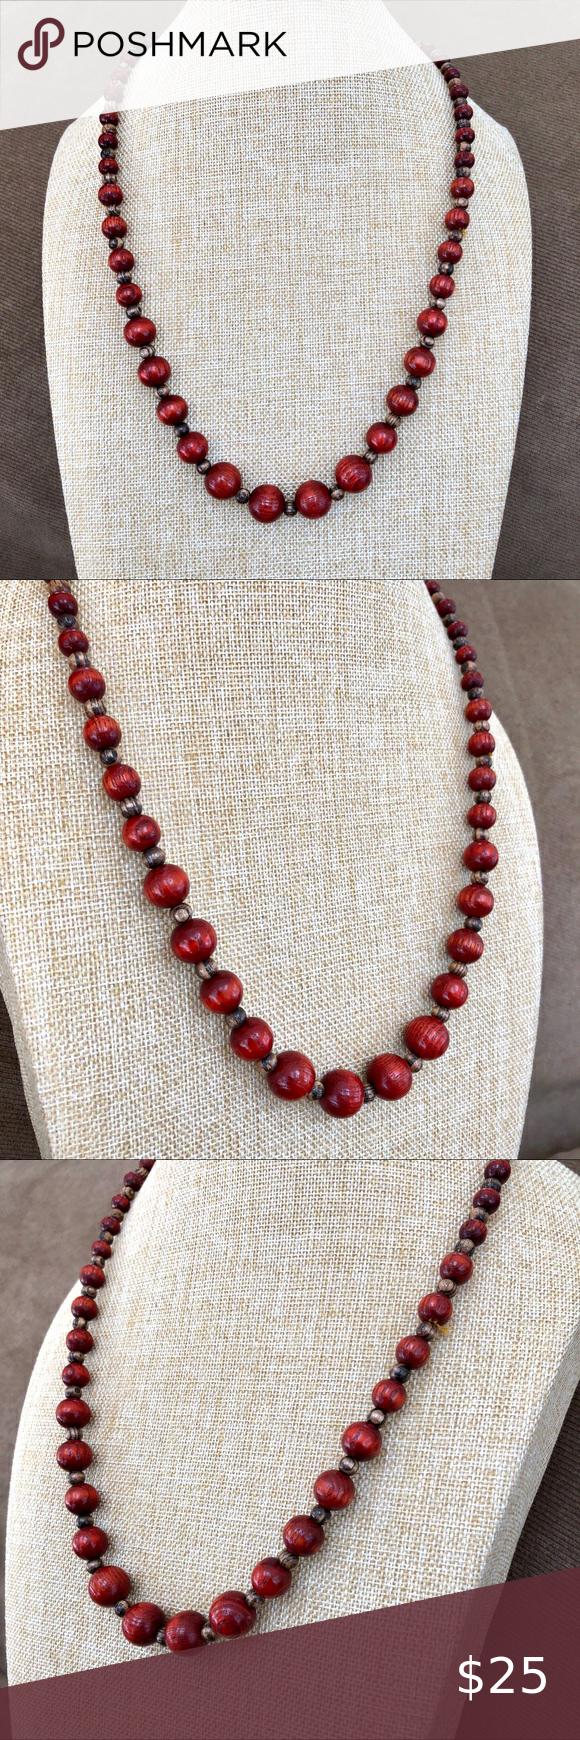 Handmade Beaded Necklace Wood /& Garnet Red Coloured Beads